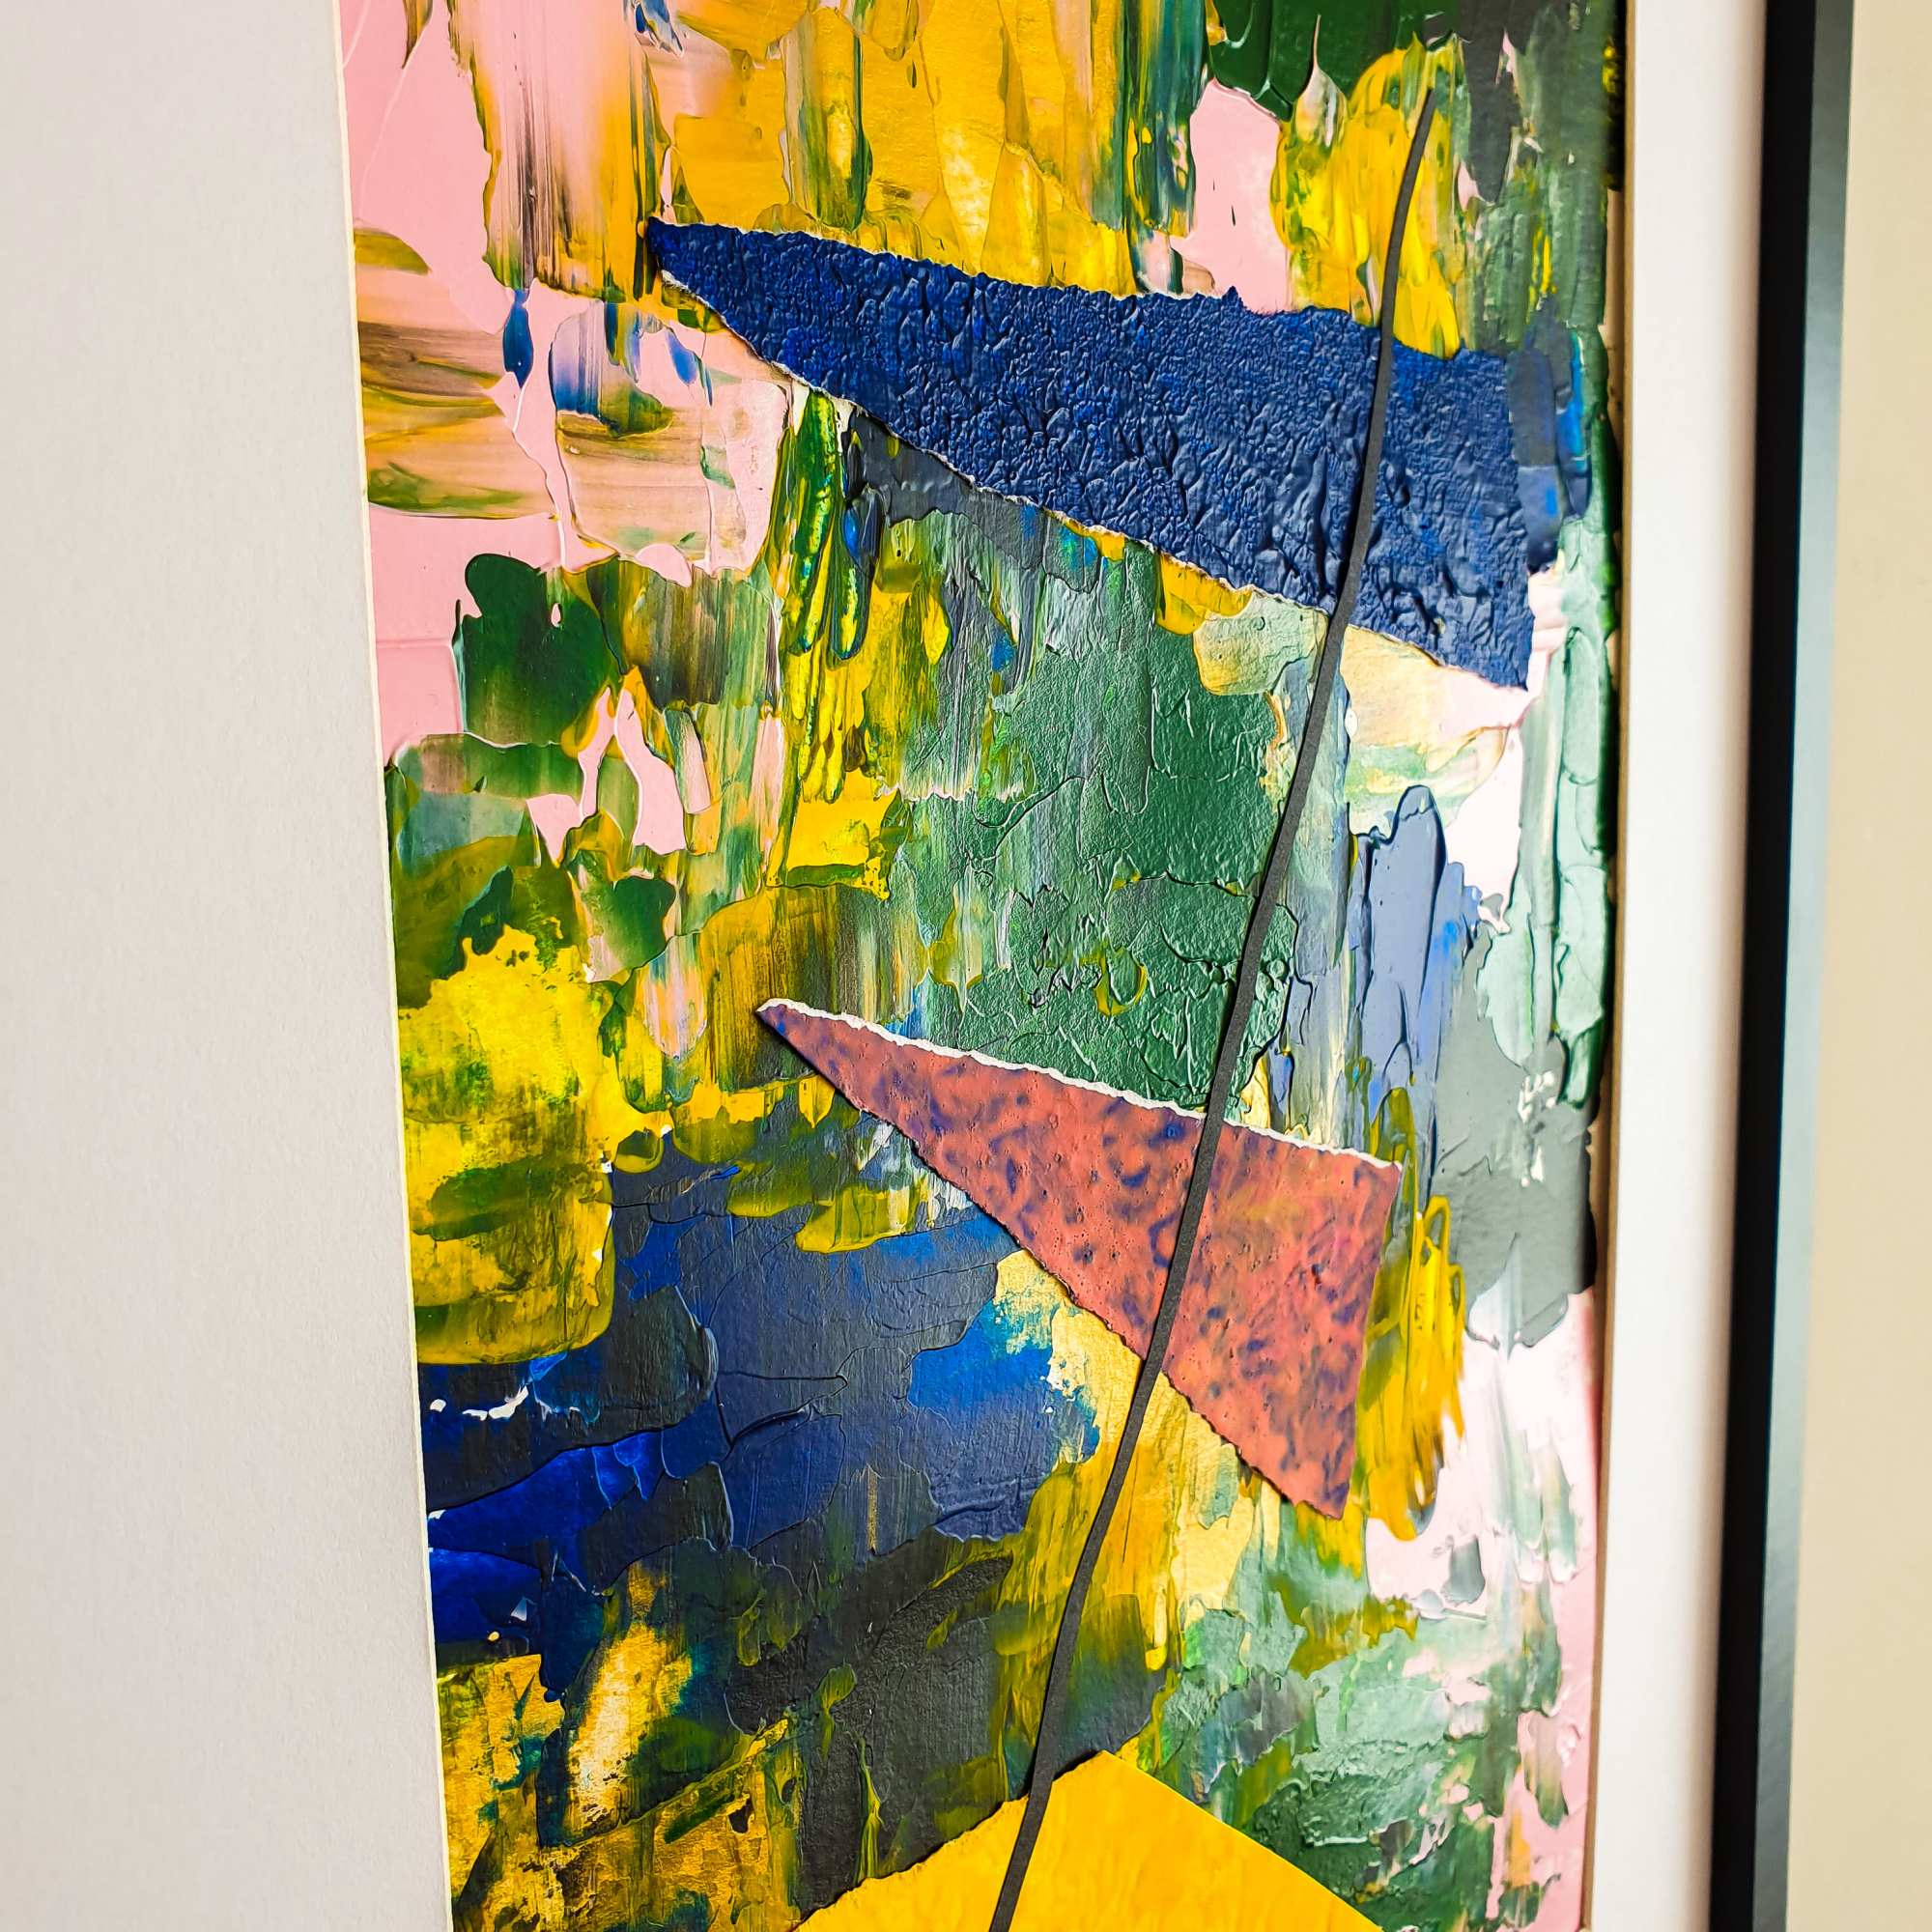 "Vista lateral del cuadro ""Kites flying: view from the sky over the forest"", obra abstracta moderna de la artista Tatuska"